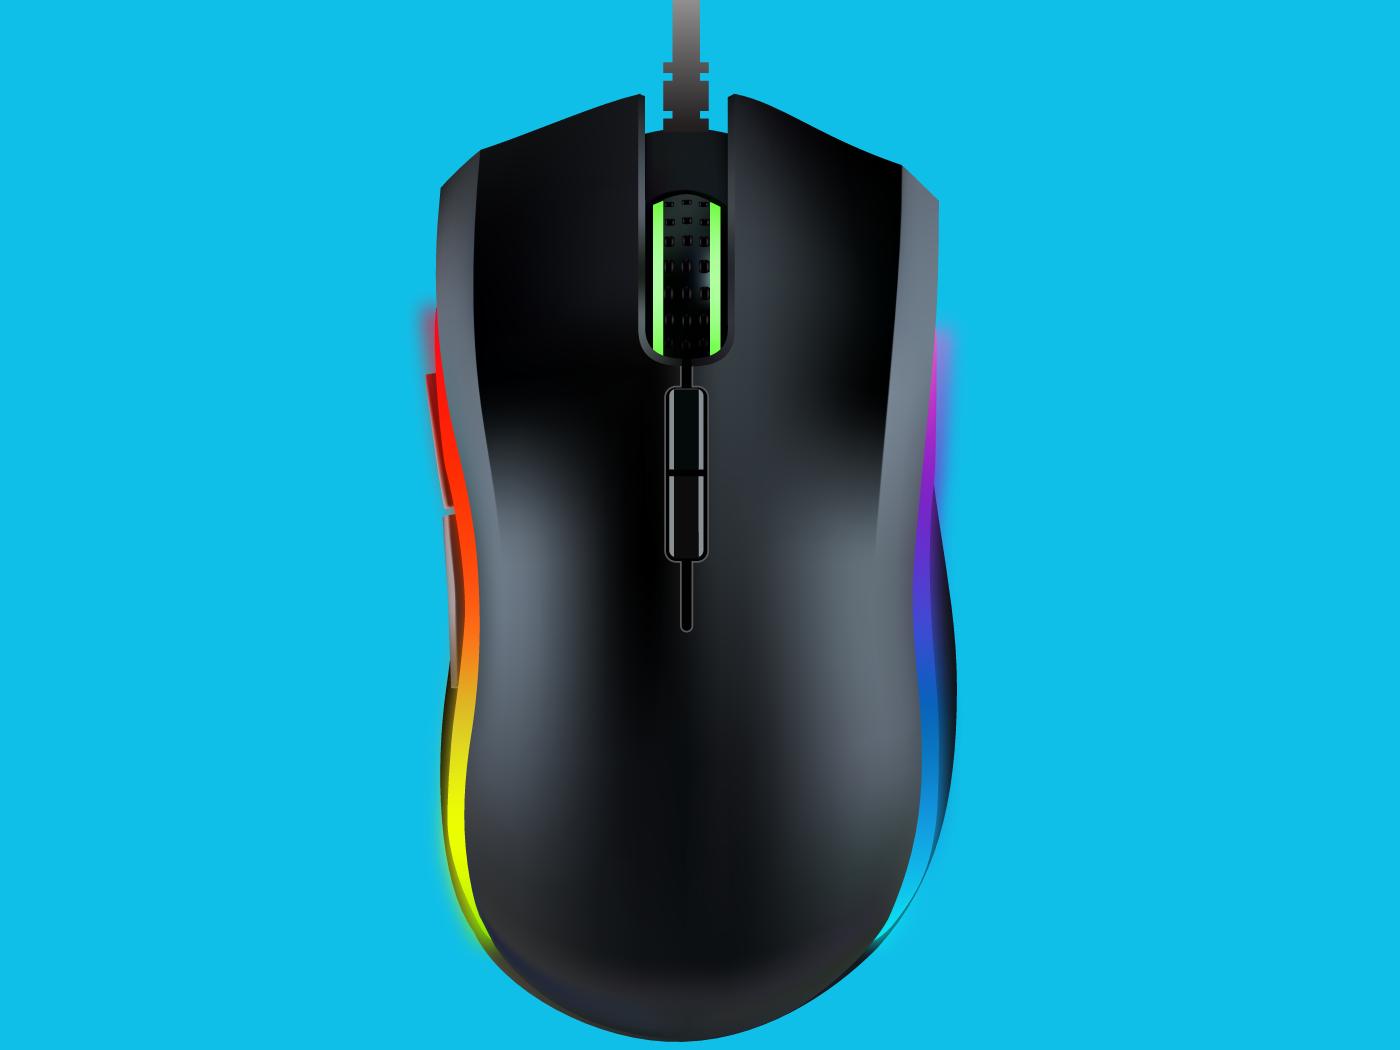 Razer Mouse Design product design vector illustration